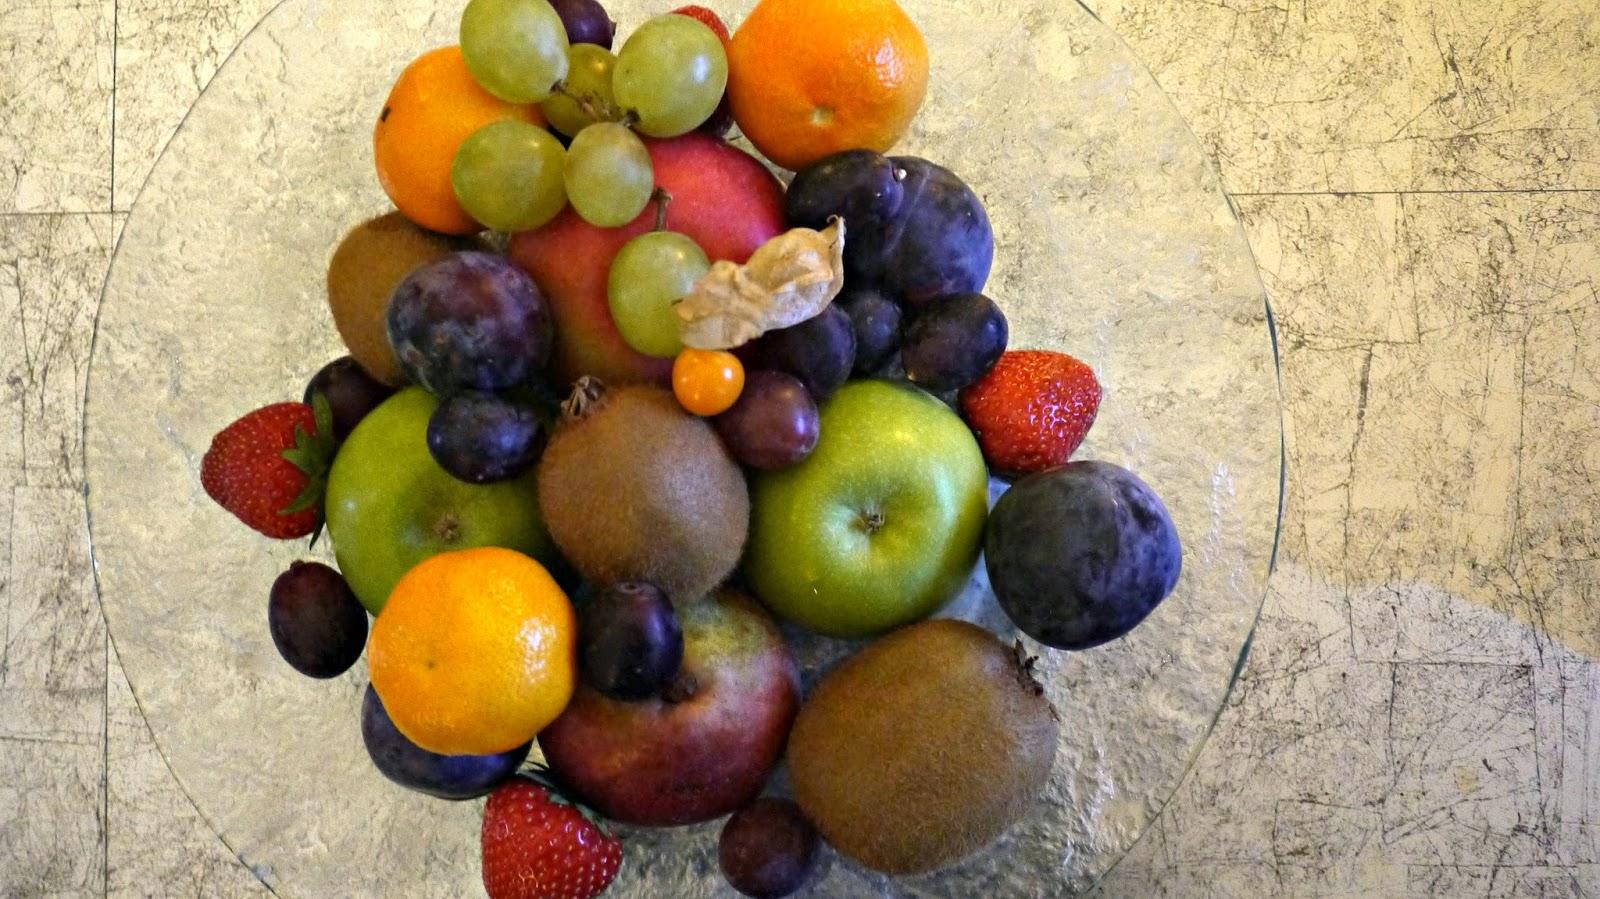 The Corinthia hotel budapest fruit platter